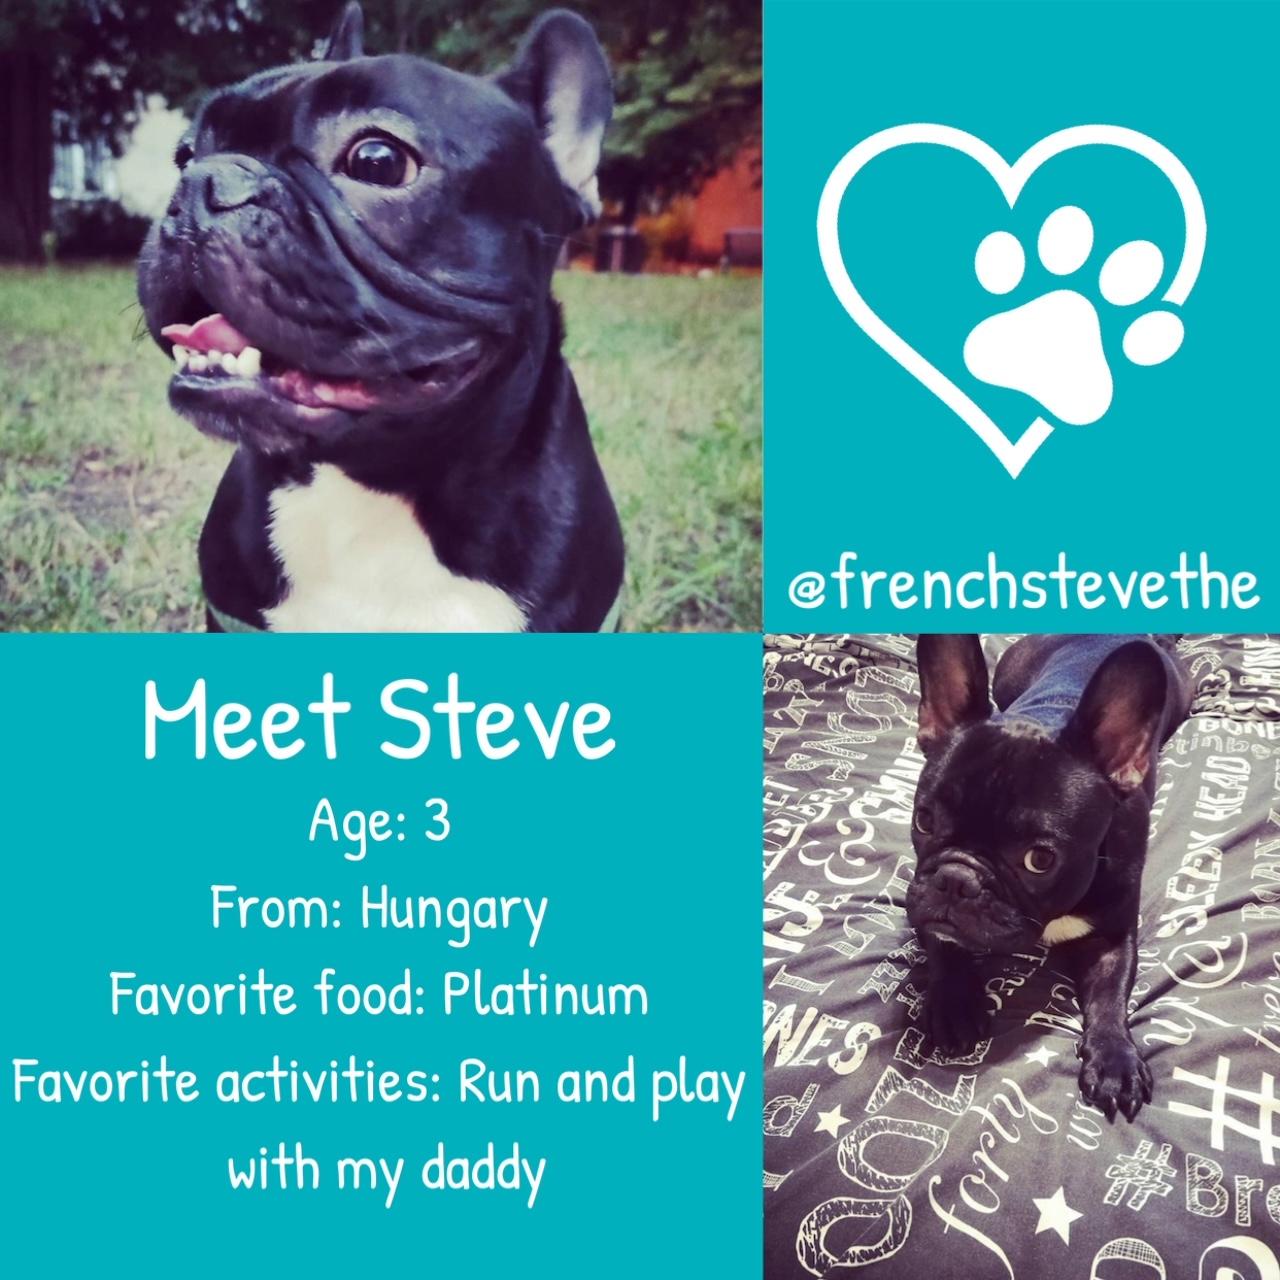 Steve the French Bulldog